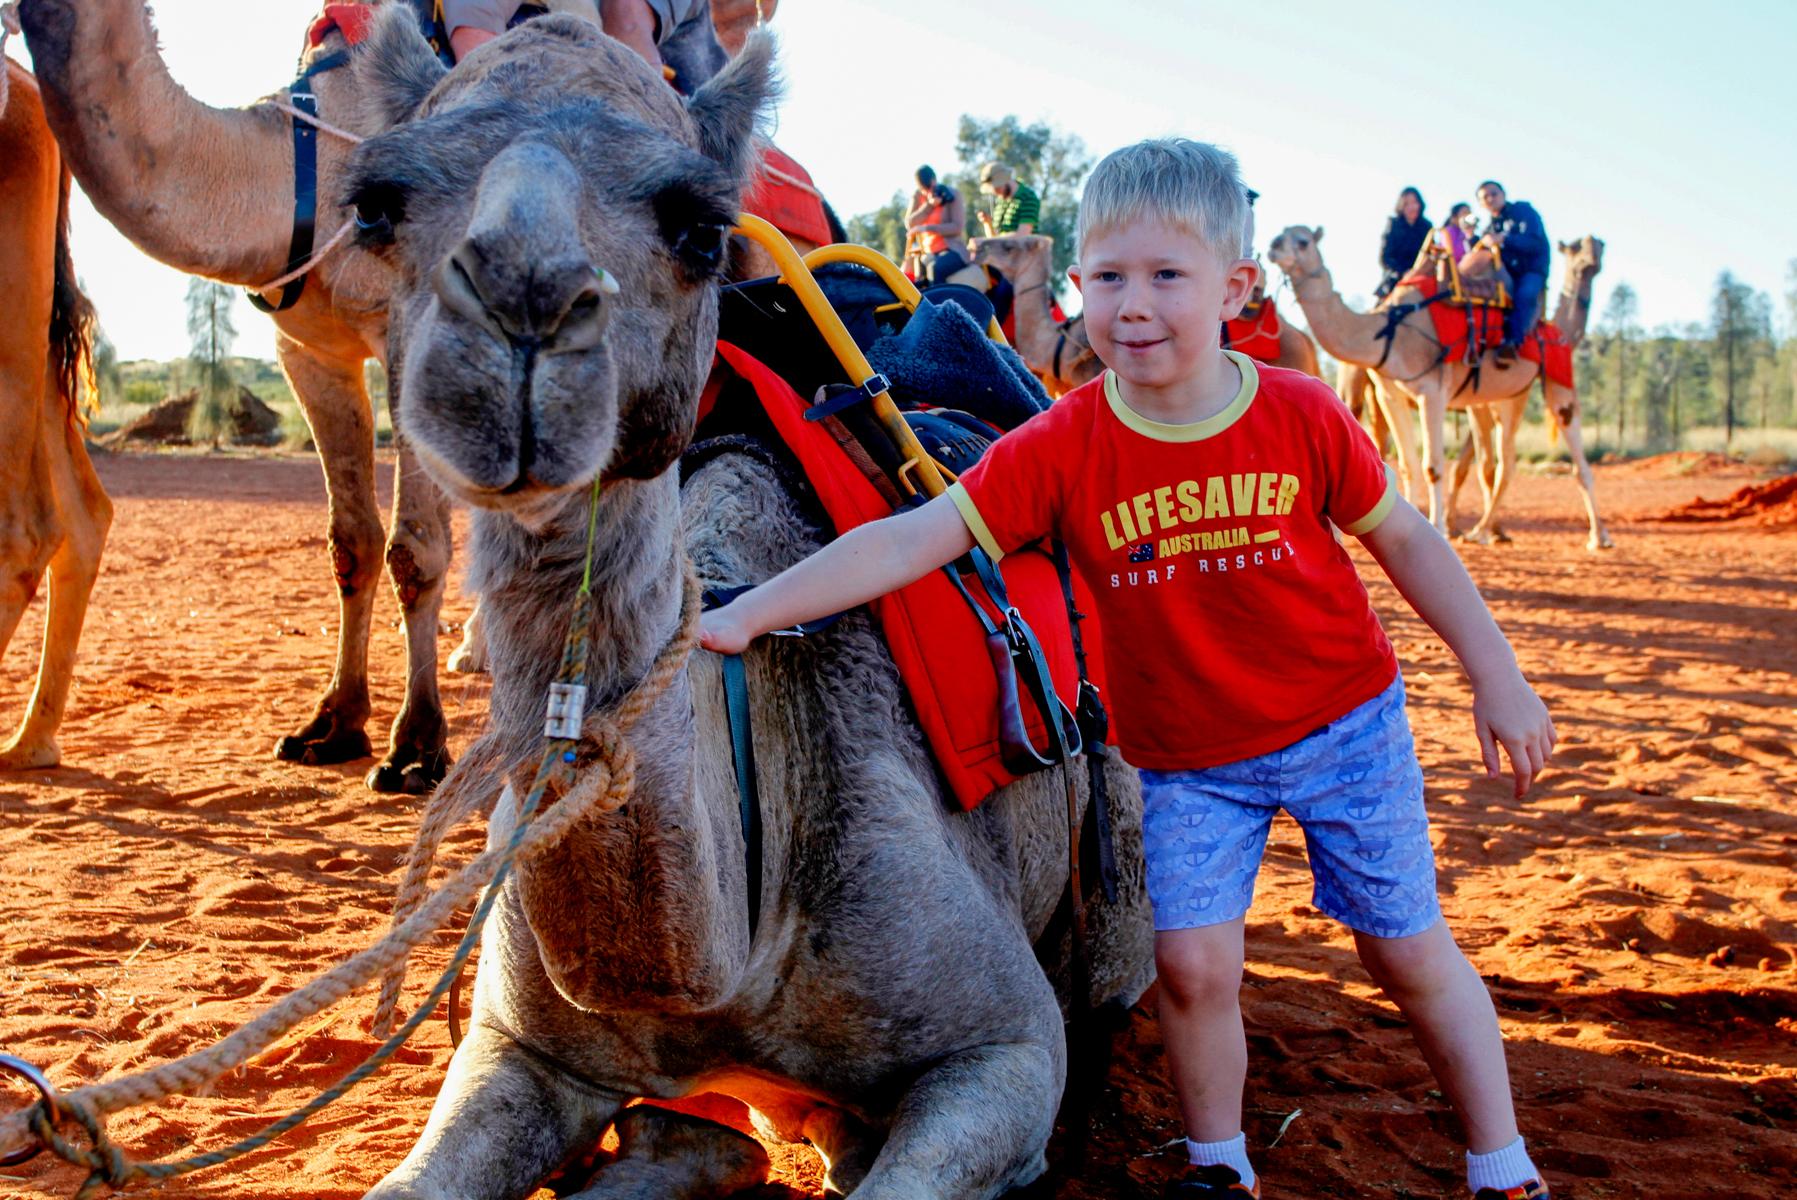 mg 2060 lr What to do in Uluru